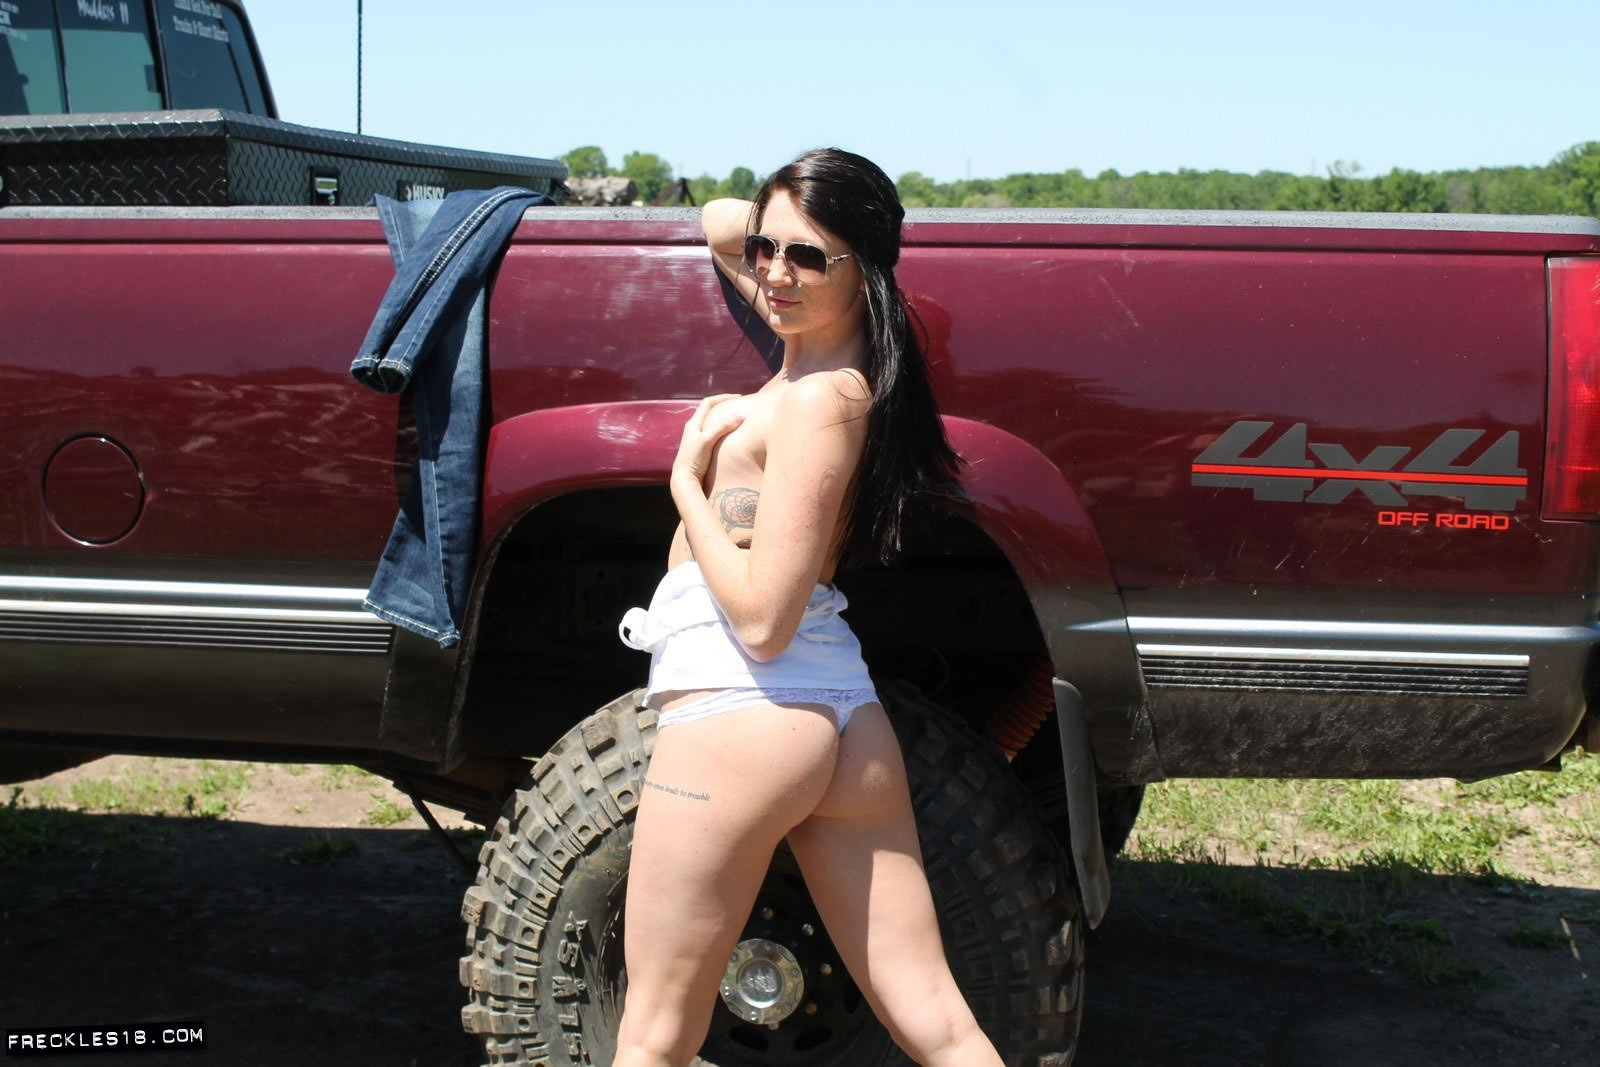 Off Road Sluts freckles18 lifted trucks and dirty sluts - fine hotties